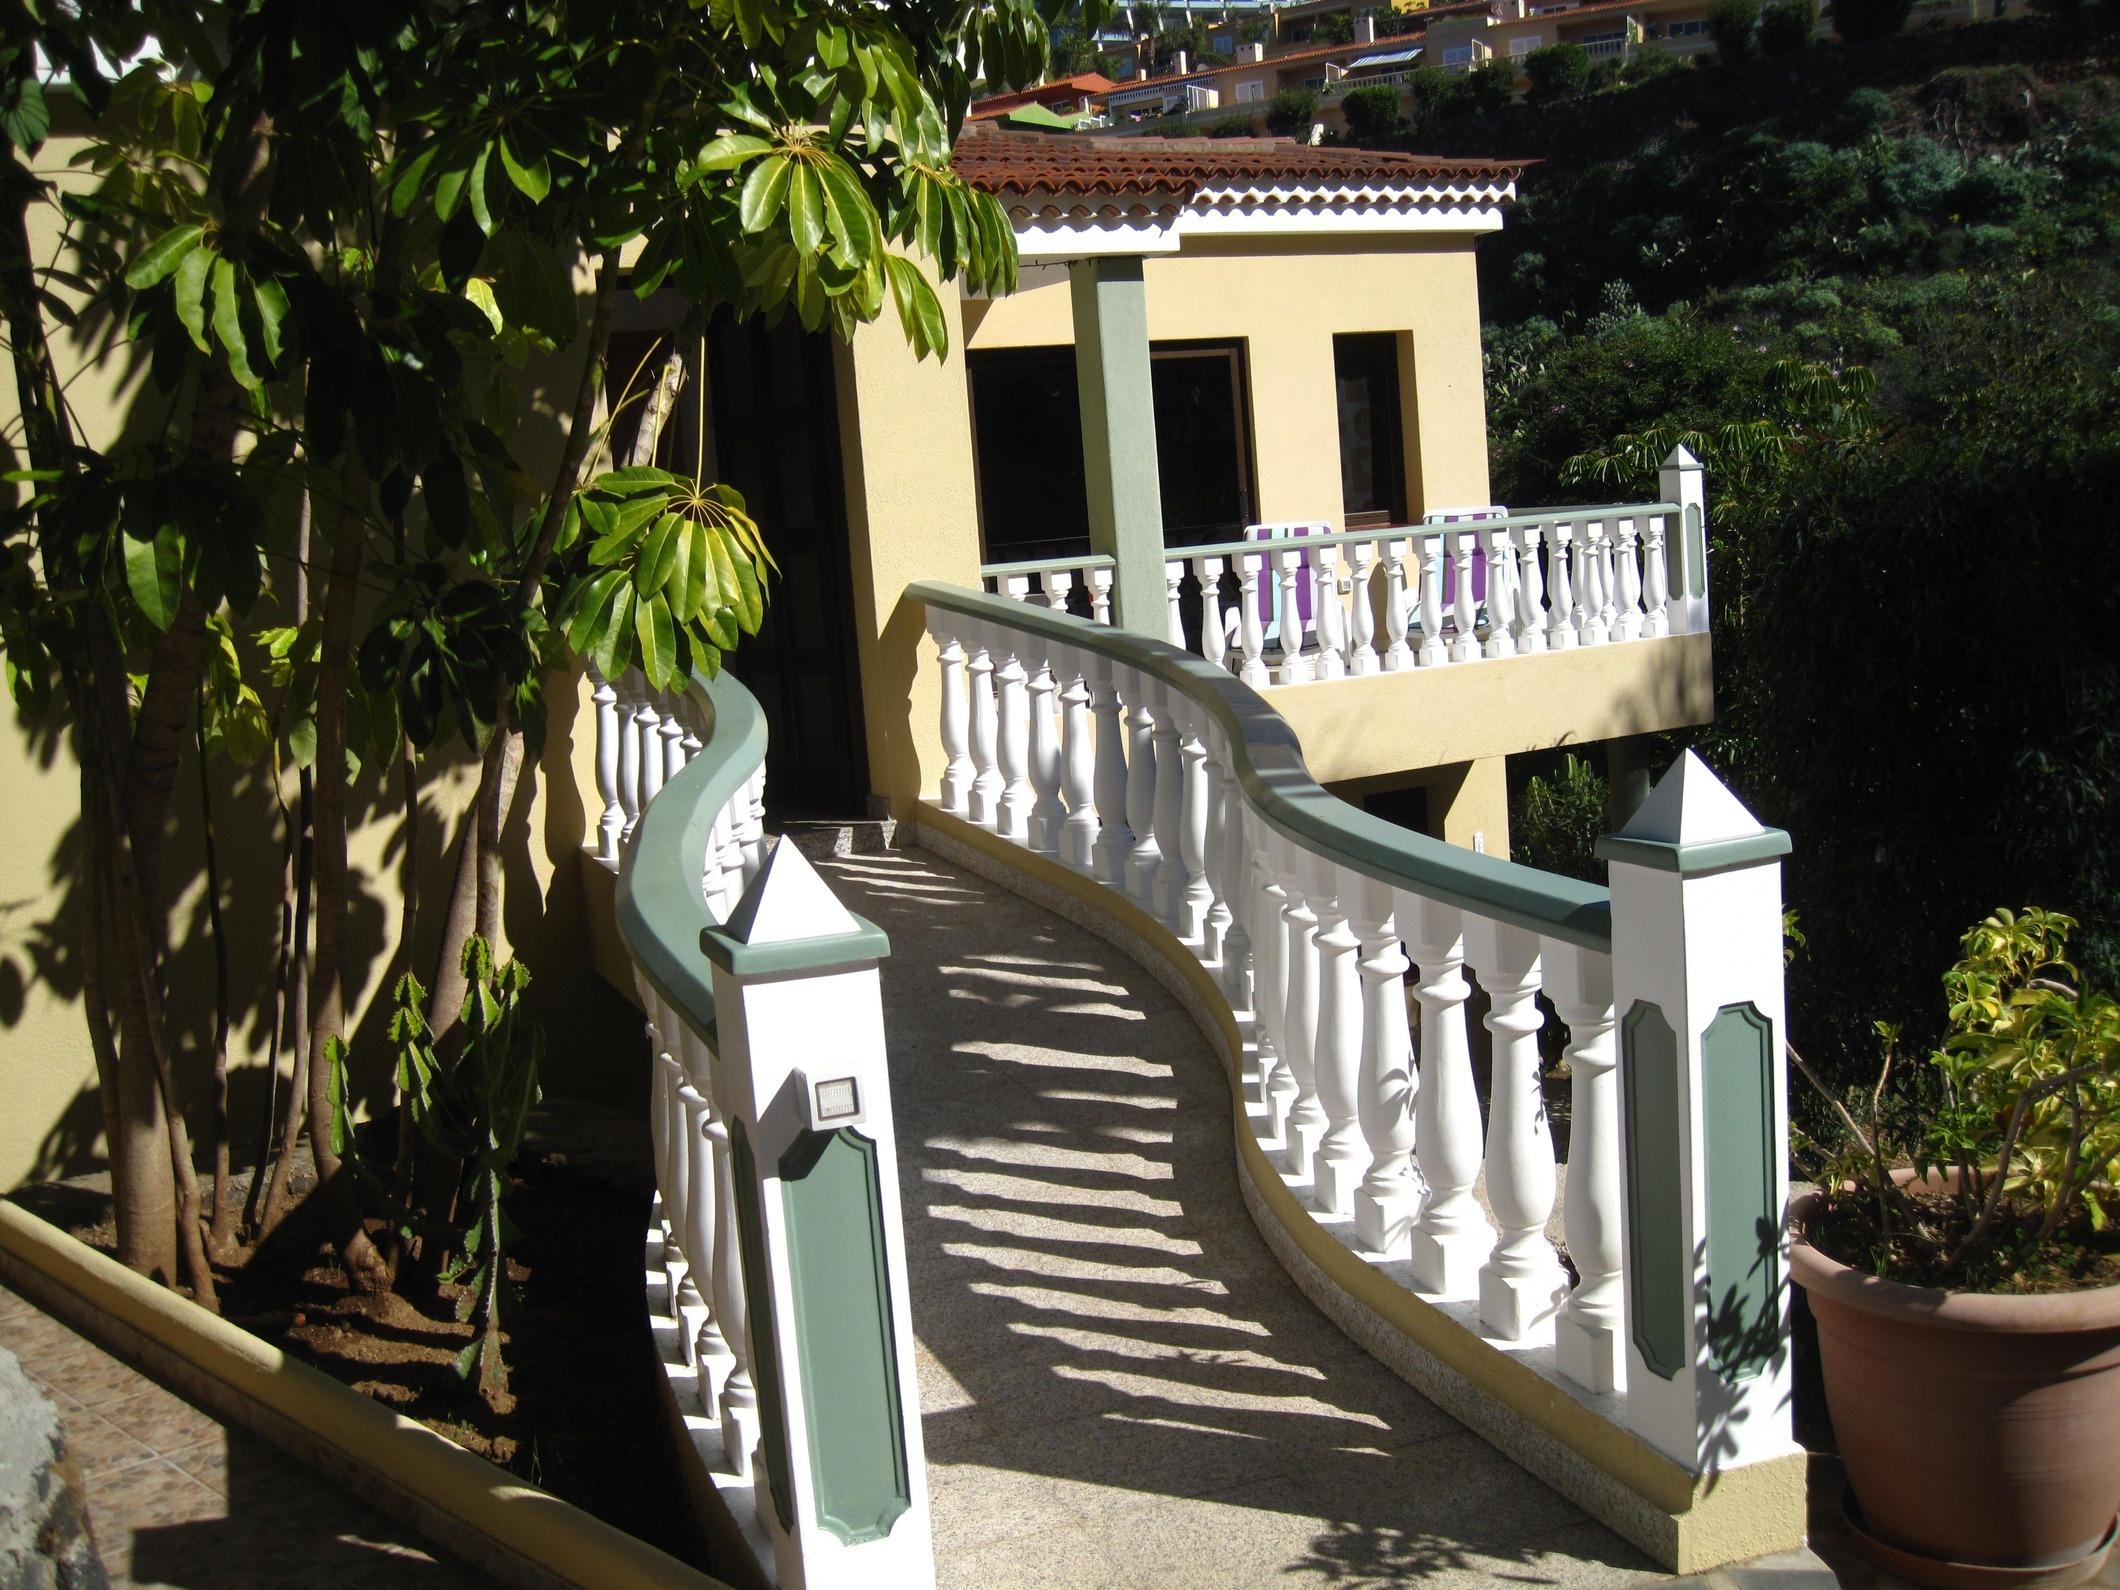 Appartement de vacances Fewo Atico Florasol, sehr ruhig direkt am Naturschutzgebiet, mit Pool, 2 Terrassen, Grill, (2492983), Santa Ursula, Ténérife, Iles Canaries, Espagne, image 12